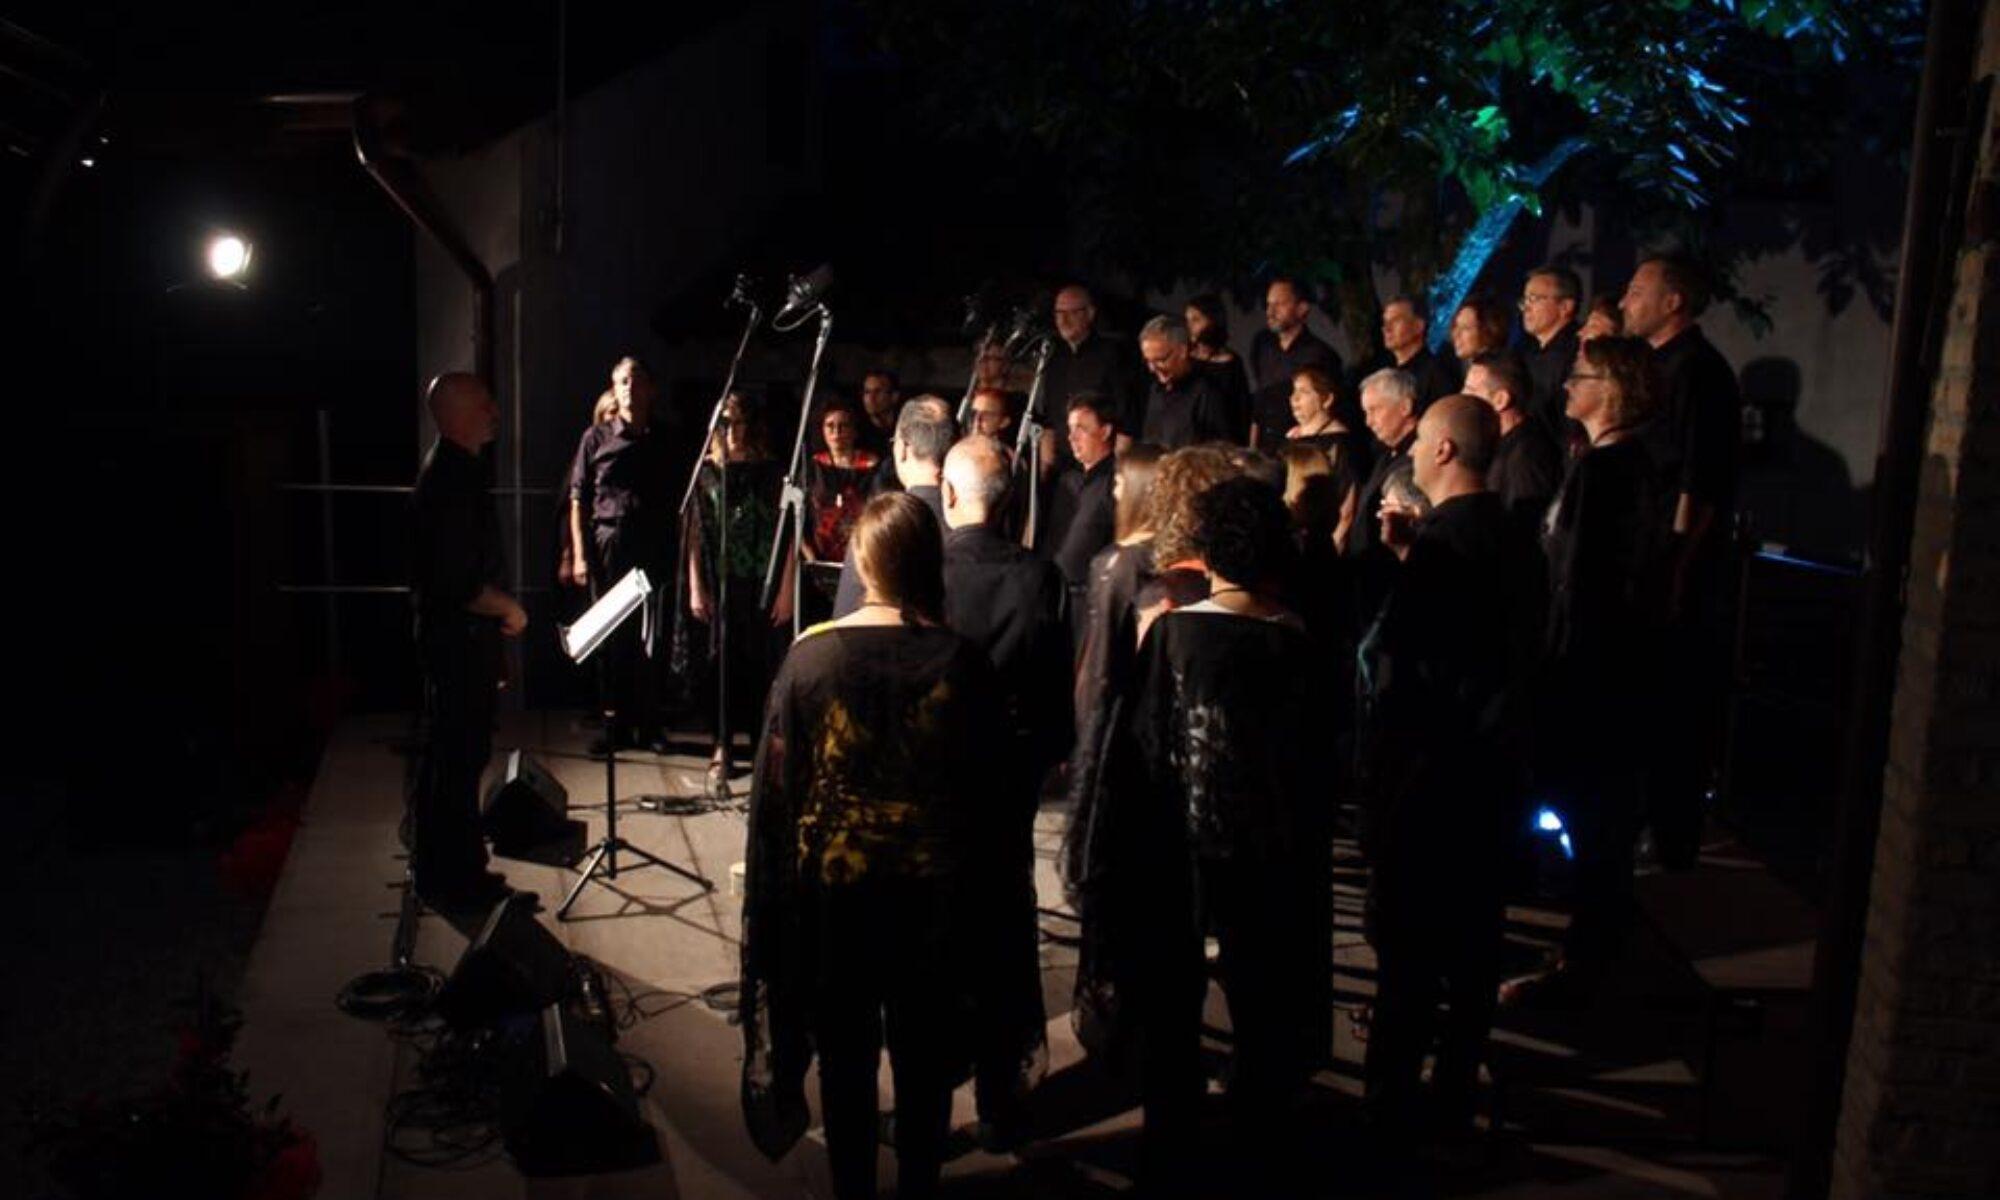 Associazione Musicale Sante Sabide APS